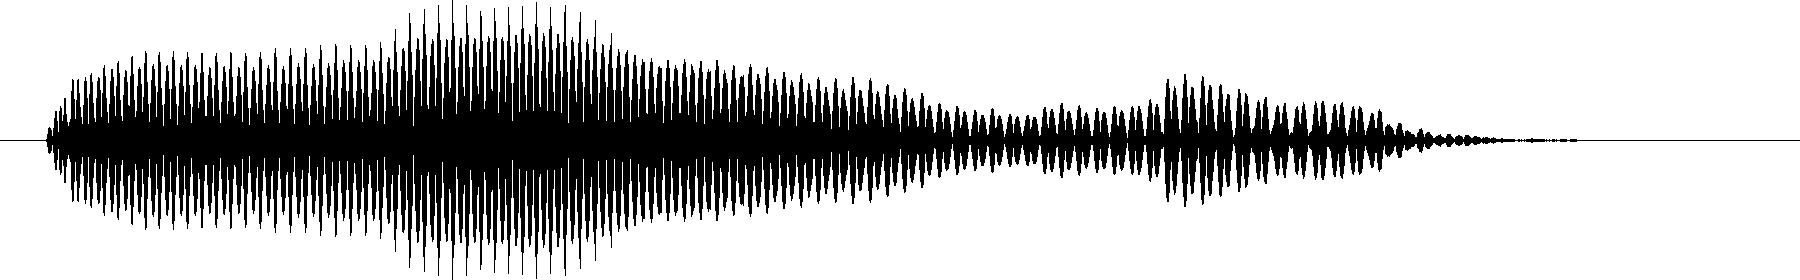 alvinspk70